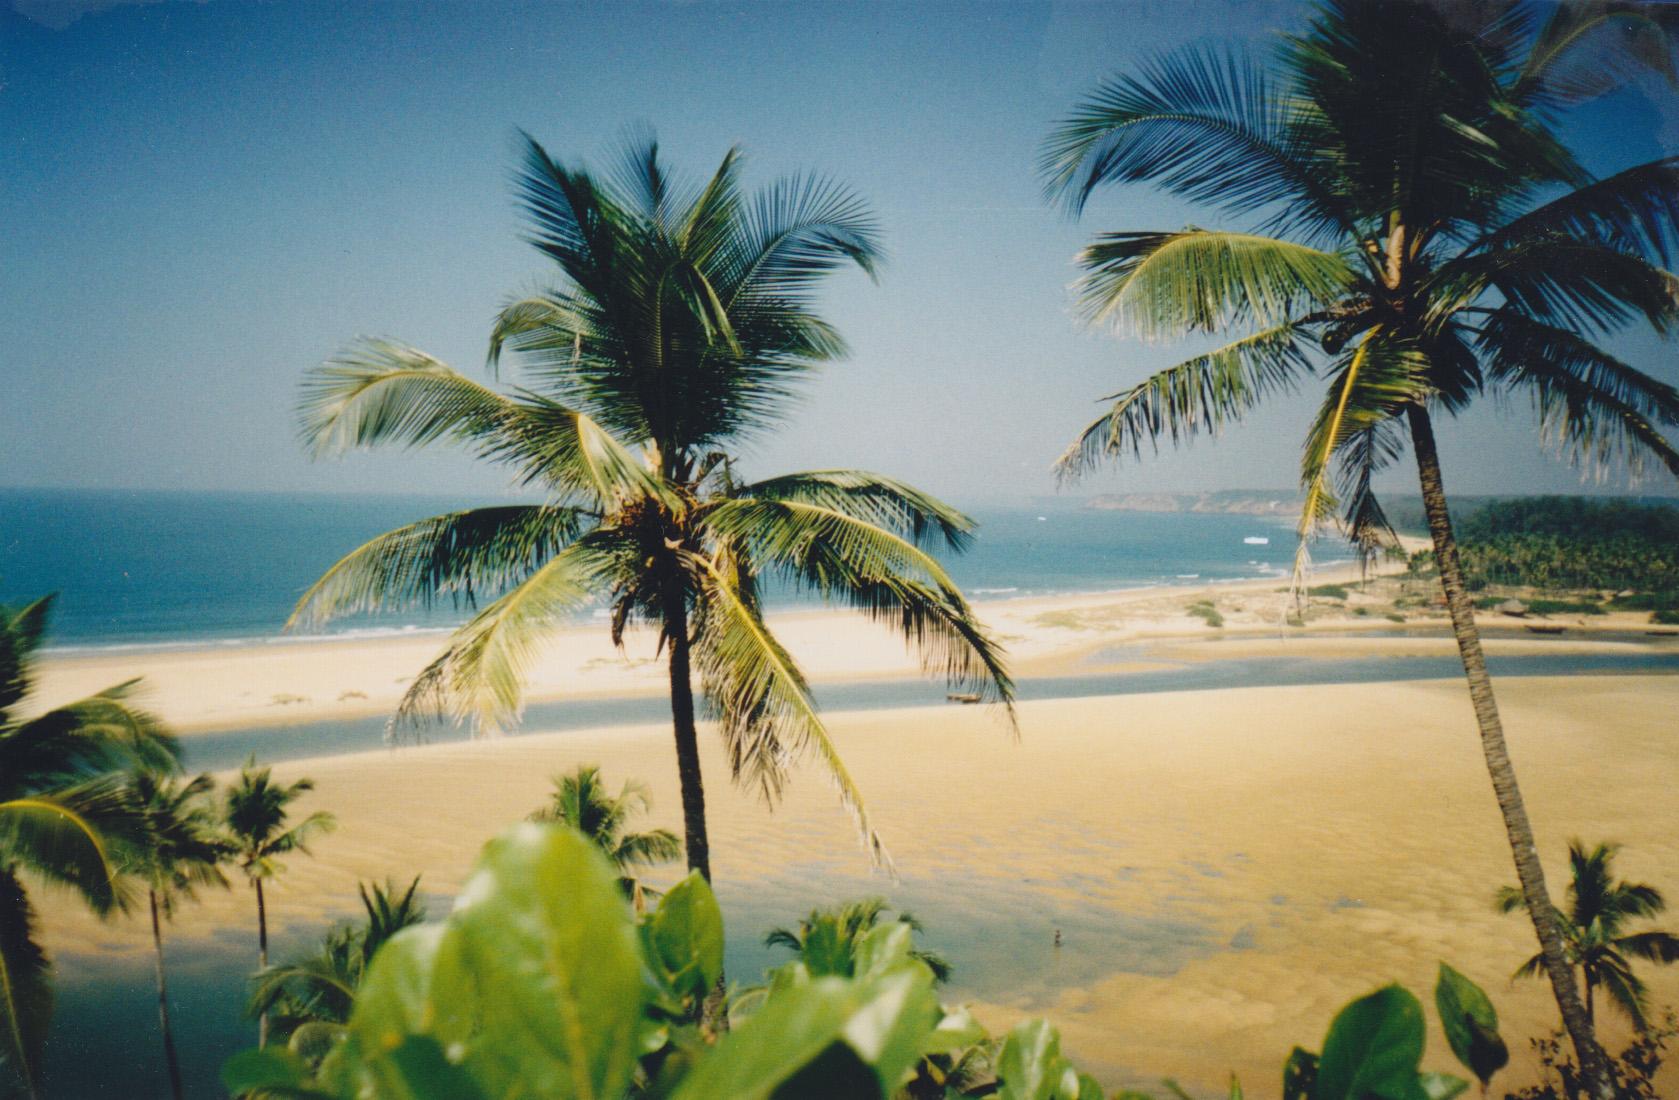 List of beaches in Goa - Wikipedia